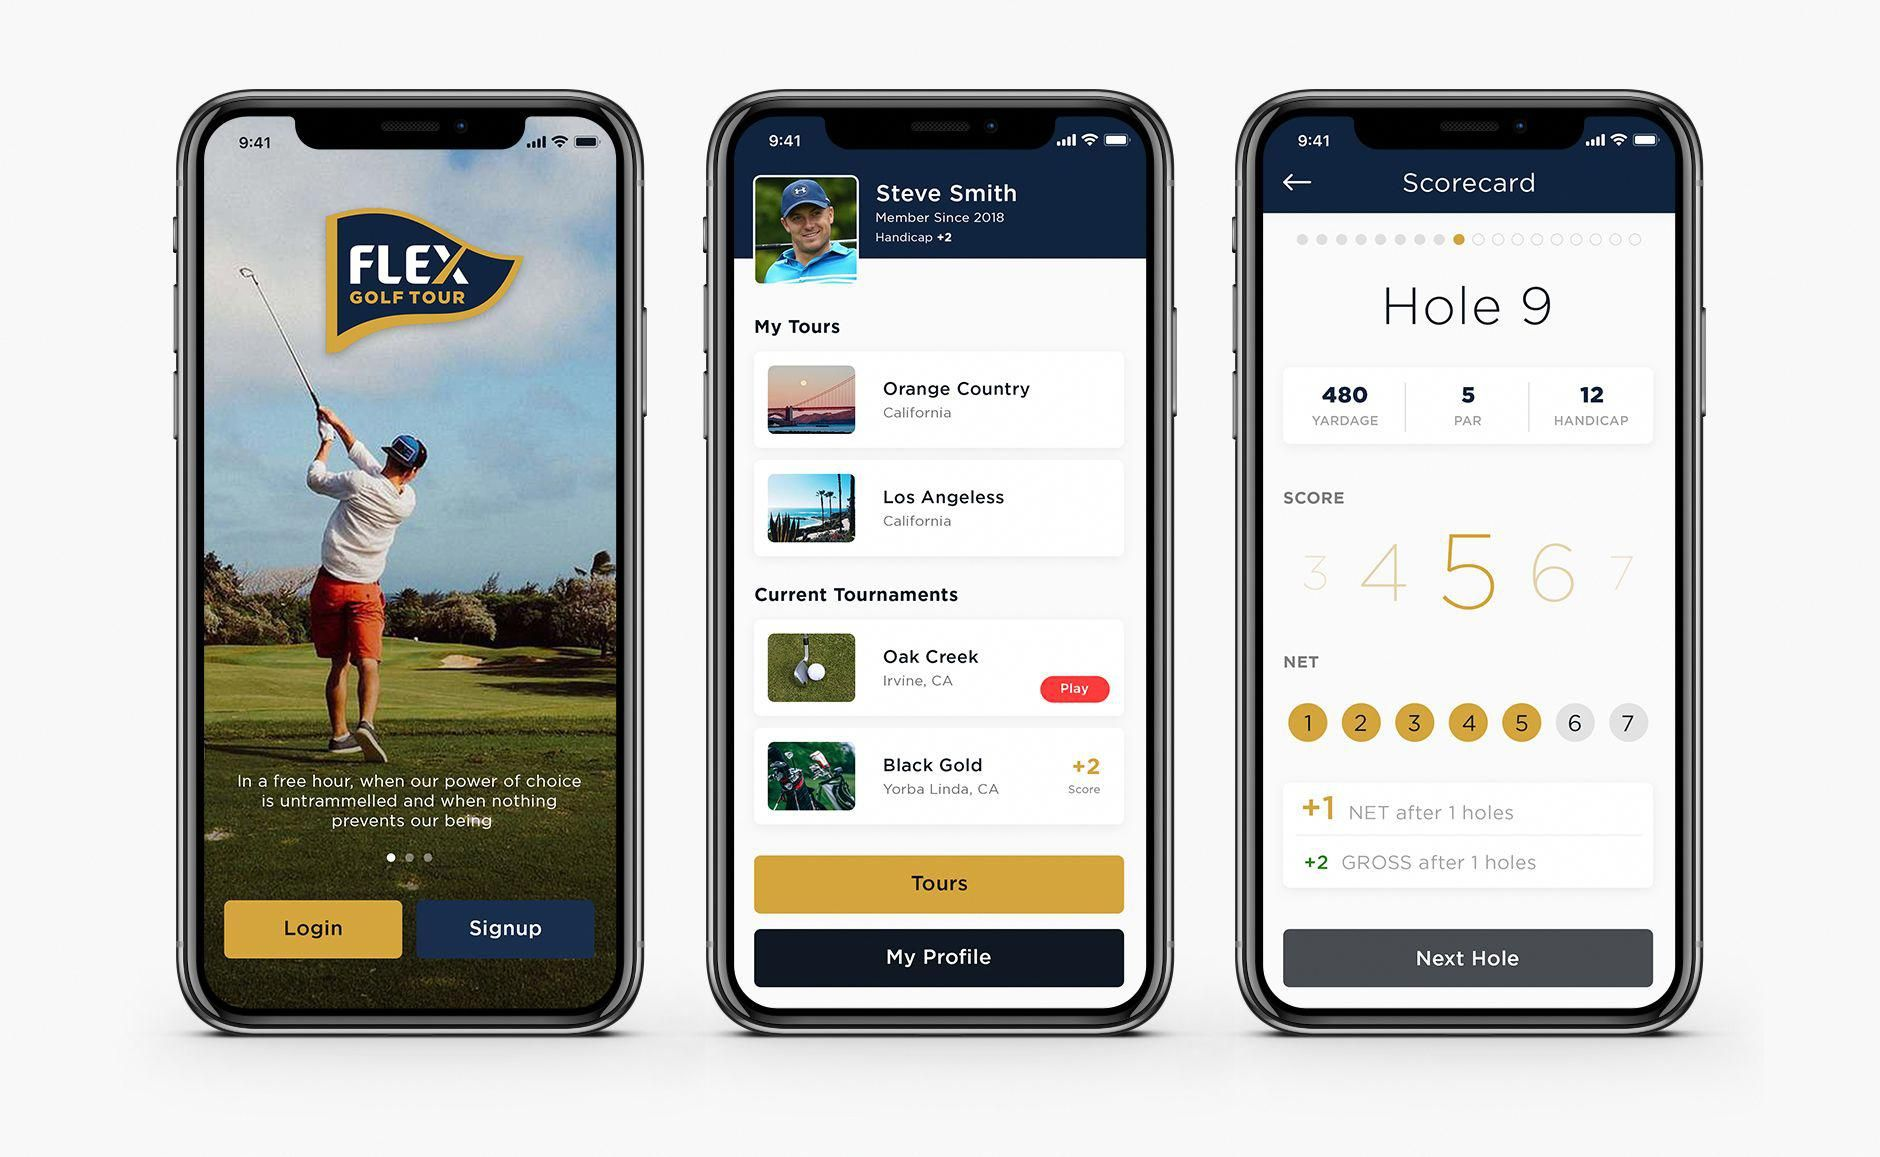 App Design For A New Competitive Social Golf Tour Esolz Appdesign Mobileapp Professional Golfapps Golf Tour Golf Apps Public Golf Courses